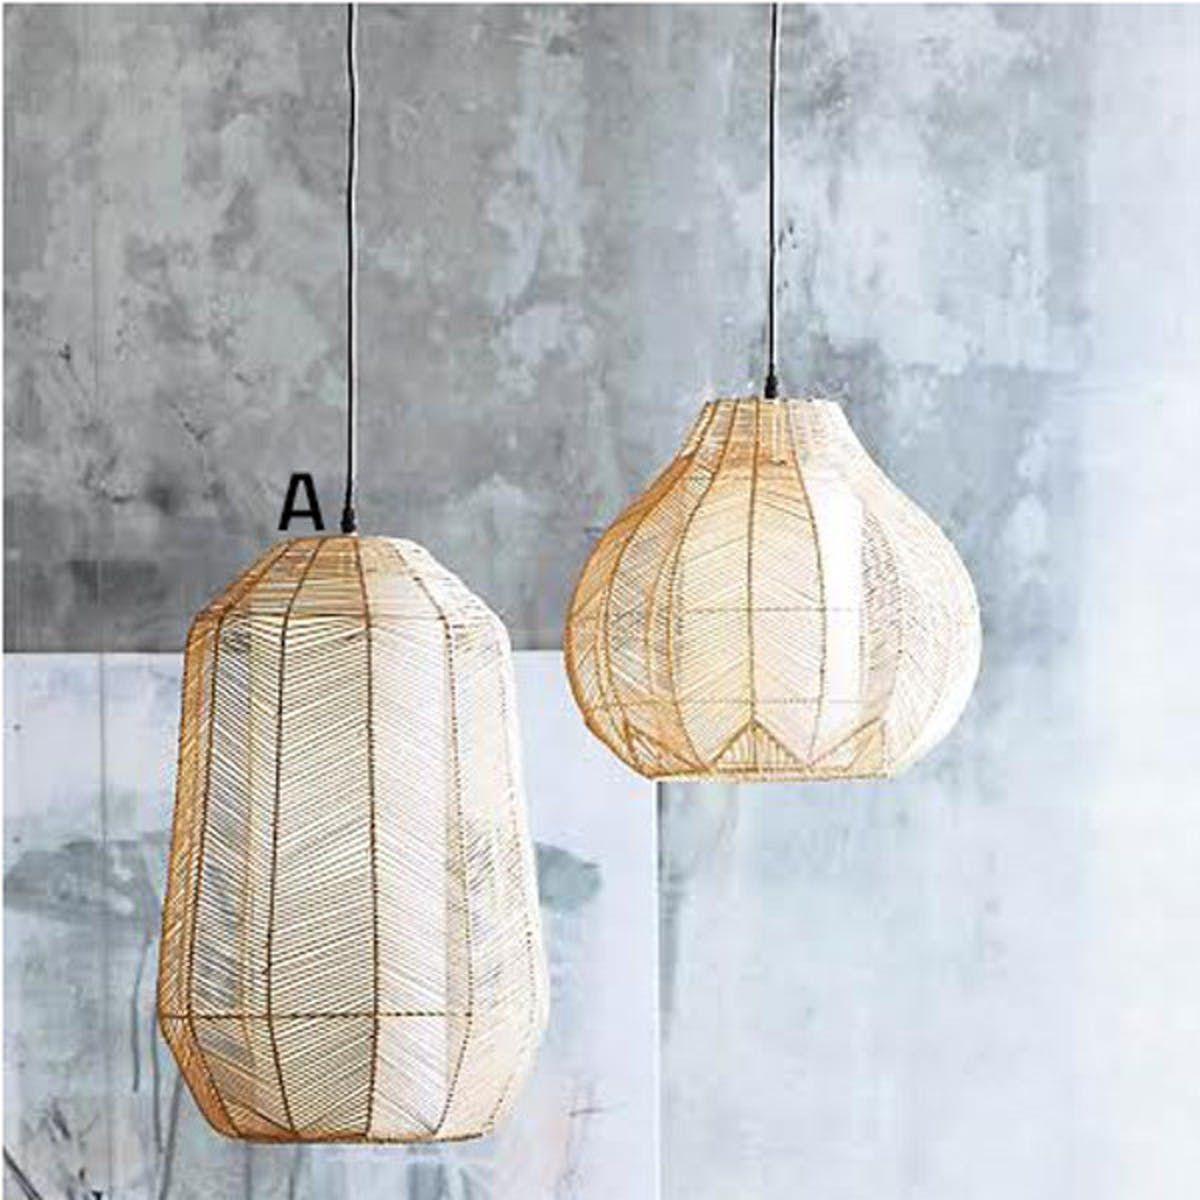 Roost Ariel Rattan Pendant LampsRoost Ariel Rattan Pendant Lamps   Pendant lamps  Rattan and Ariel. Roost Lighting Design. Home Design Ideas